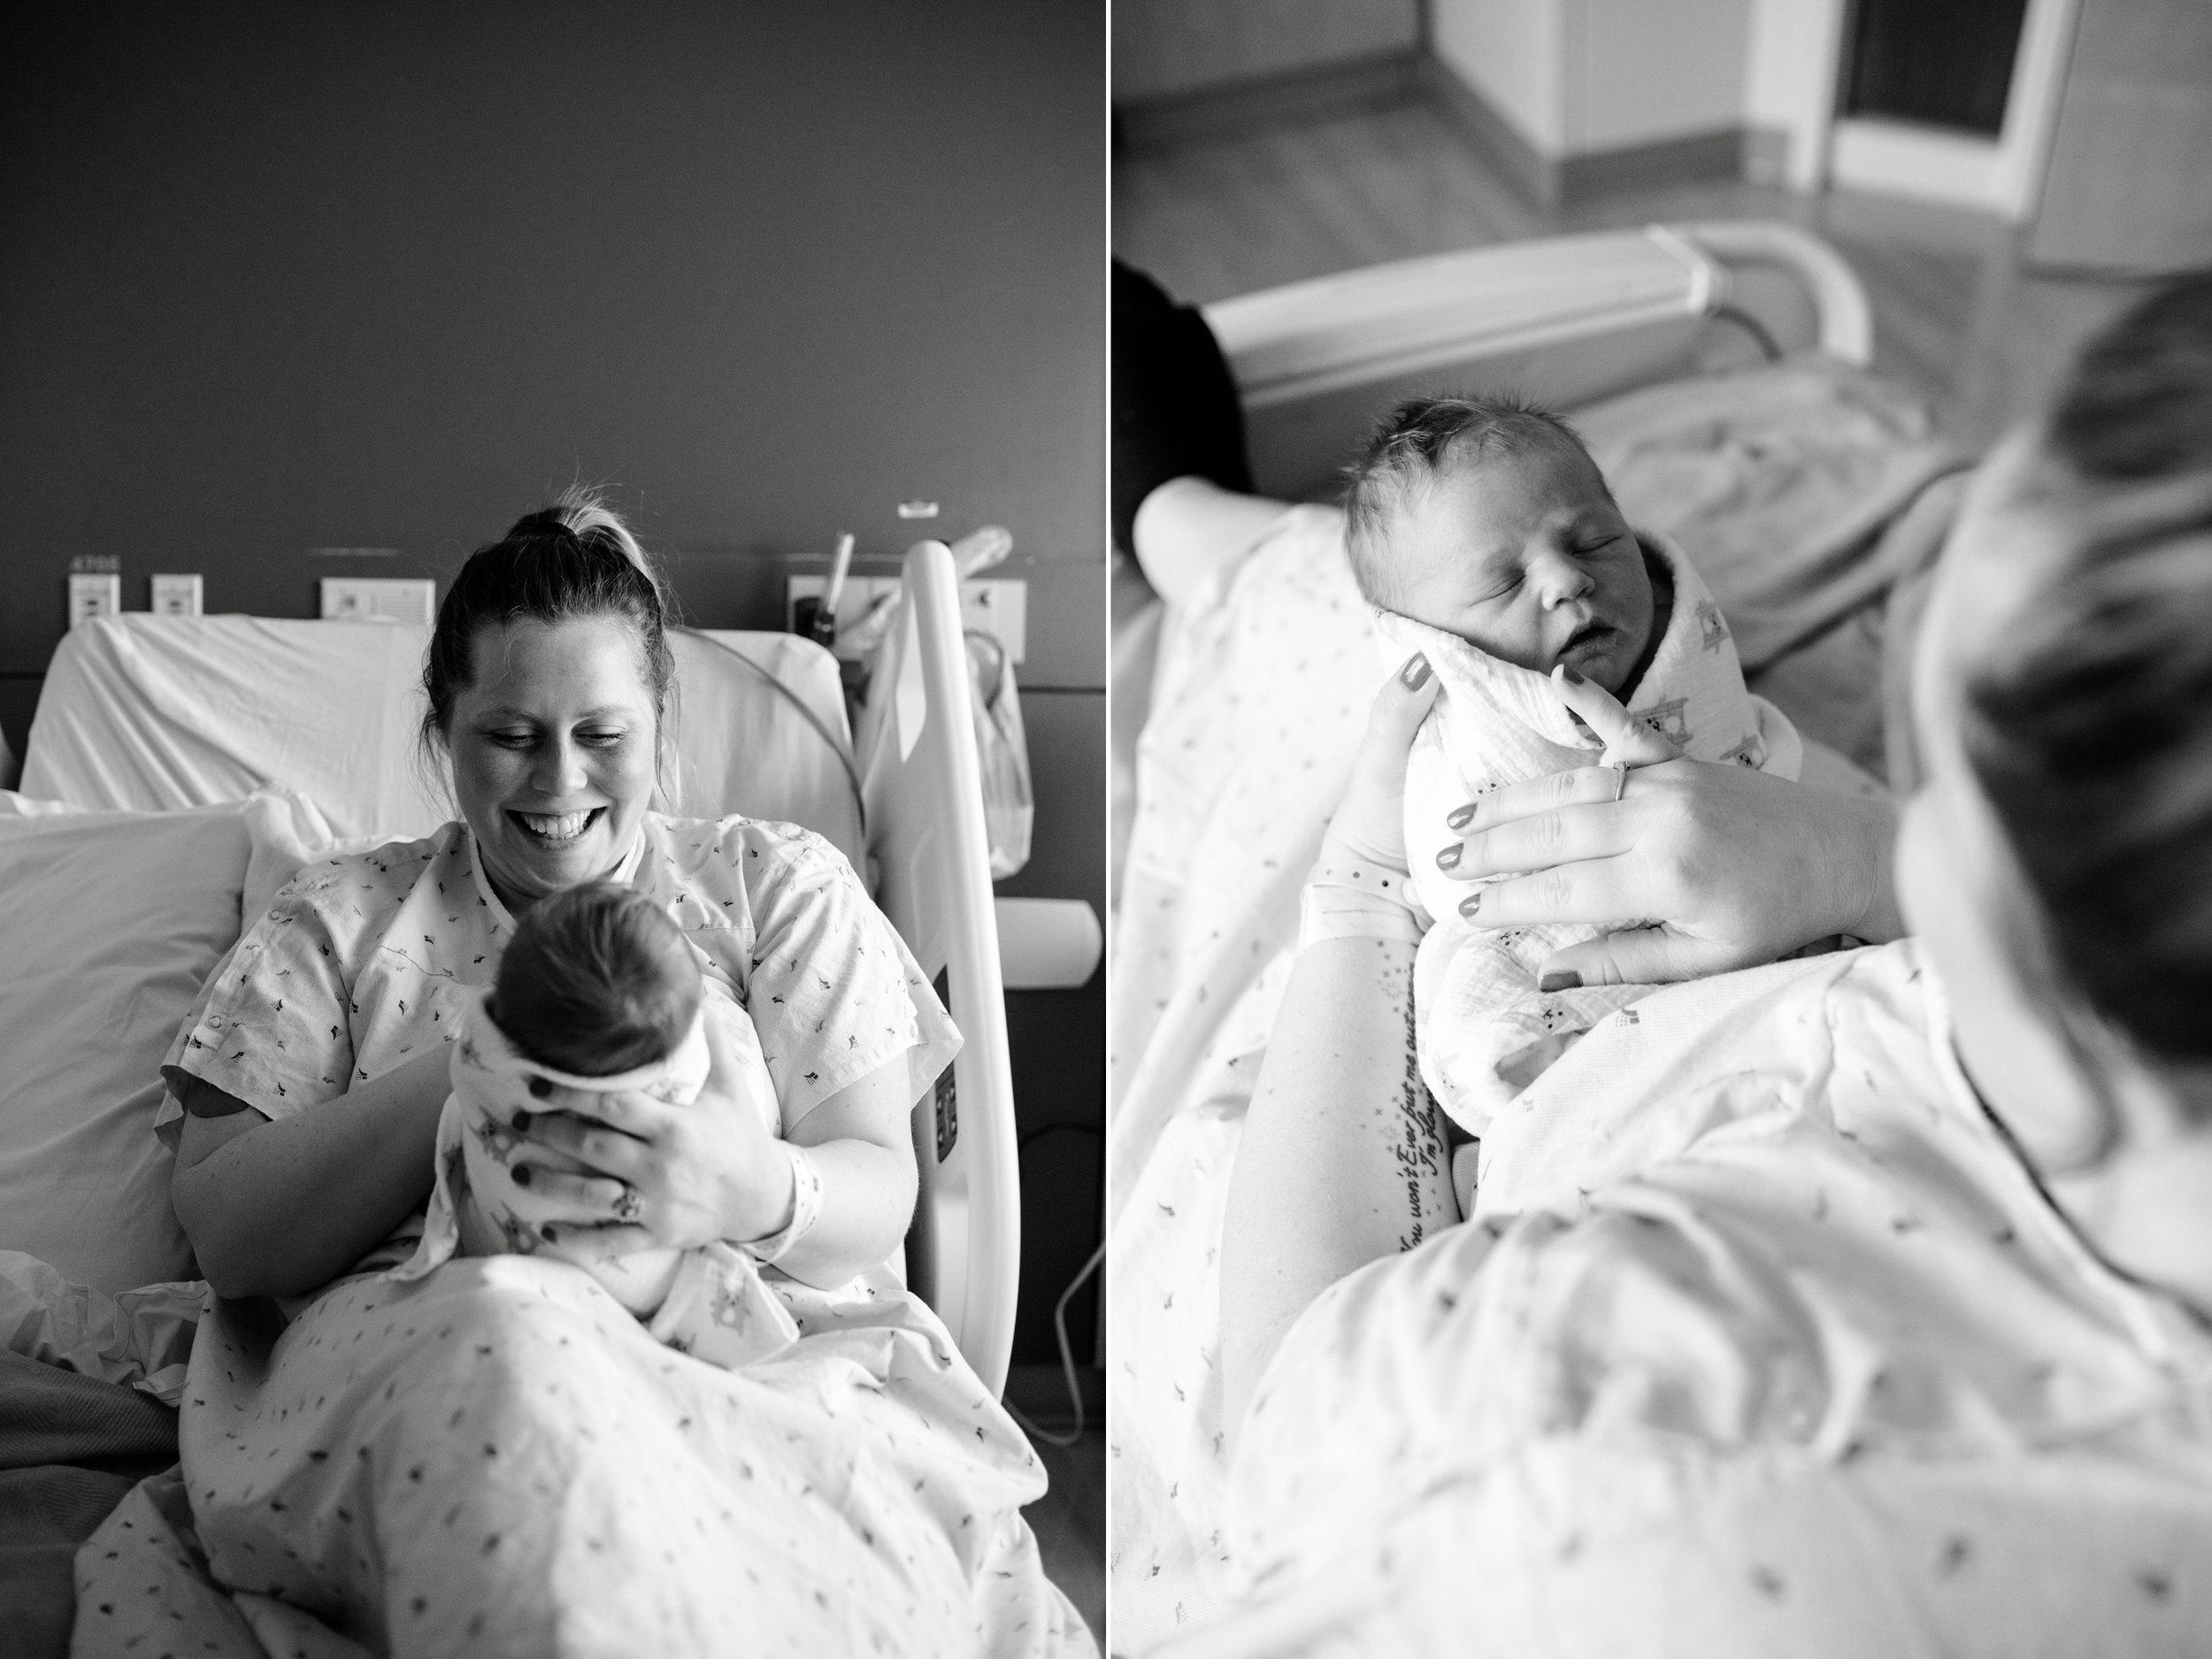 maine-fresh48-newborn-photographer -3a.jpg